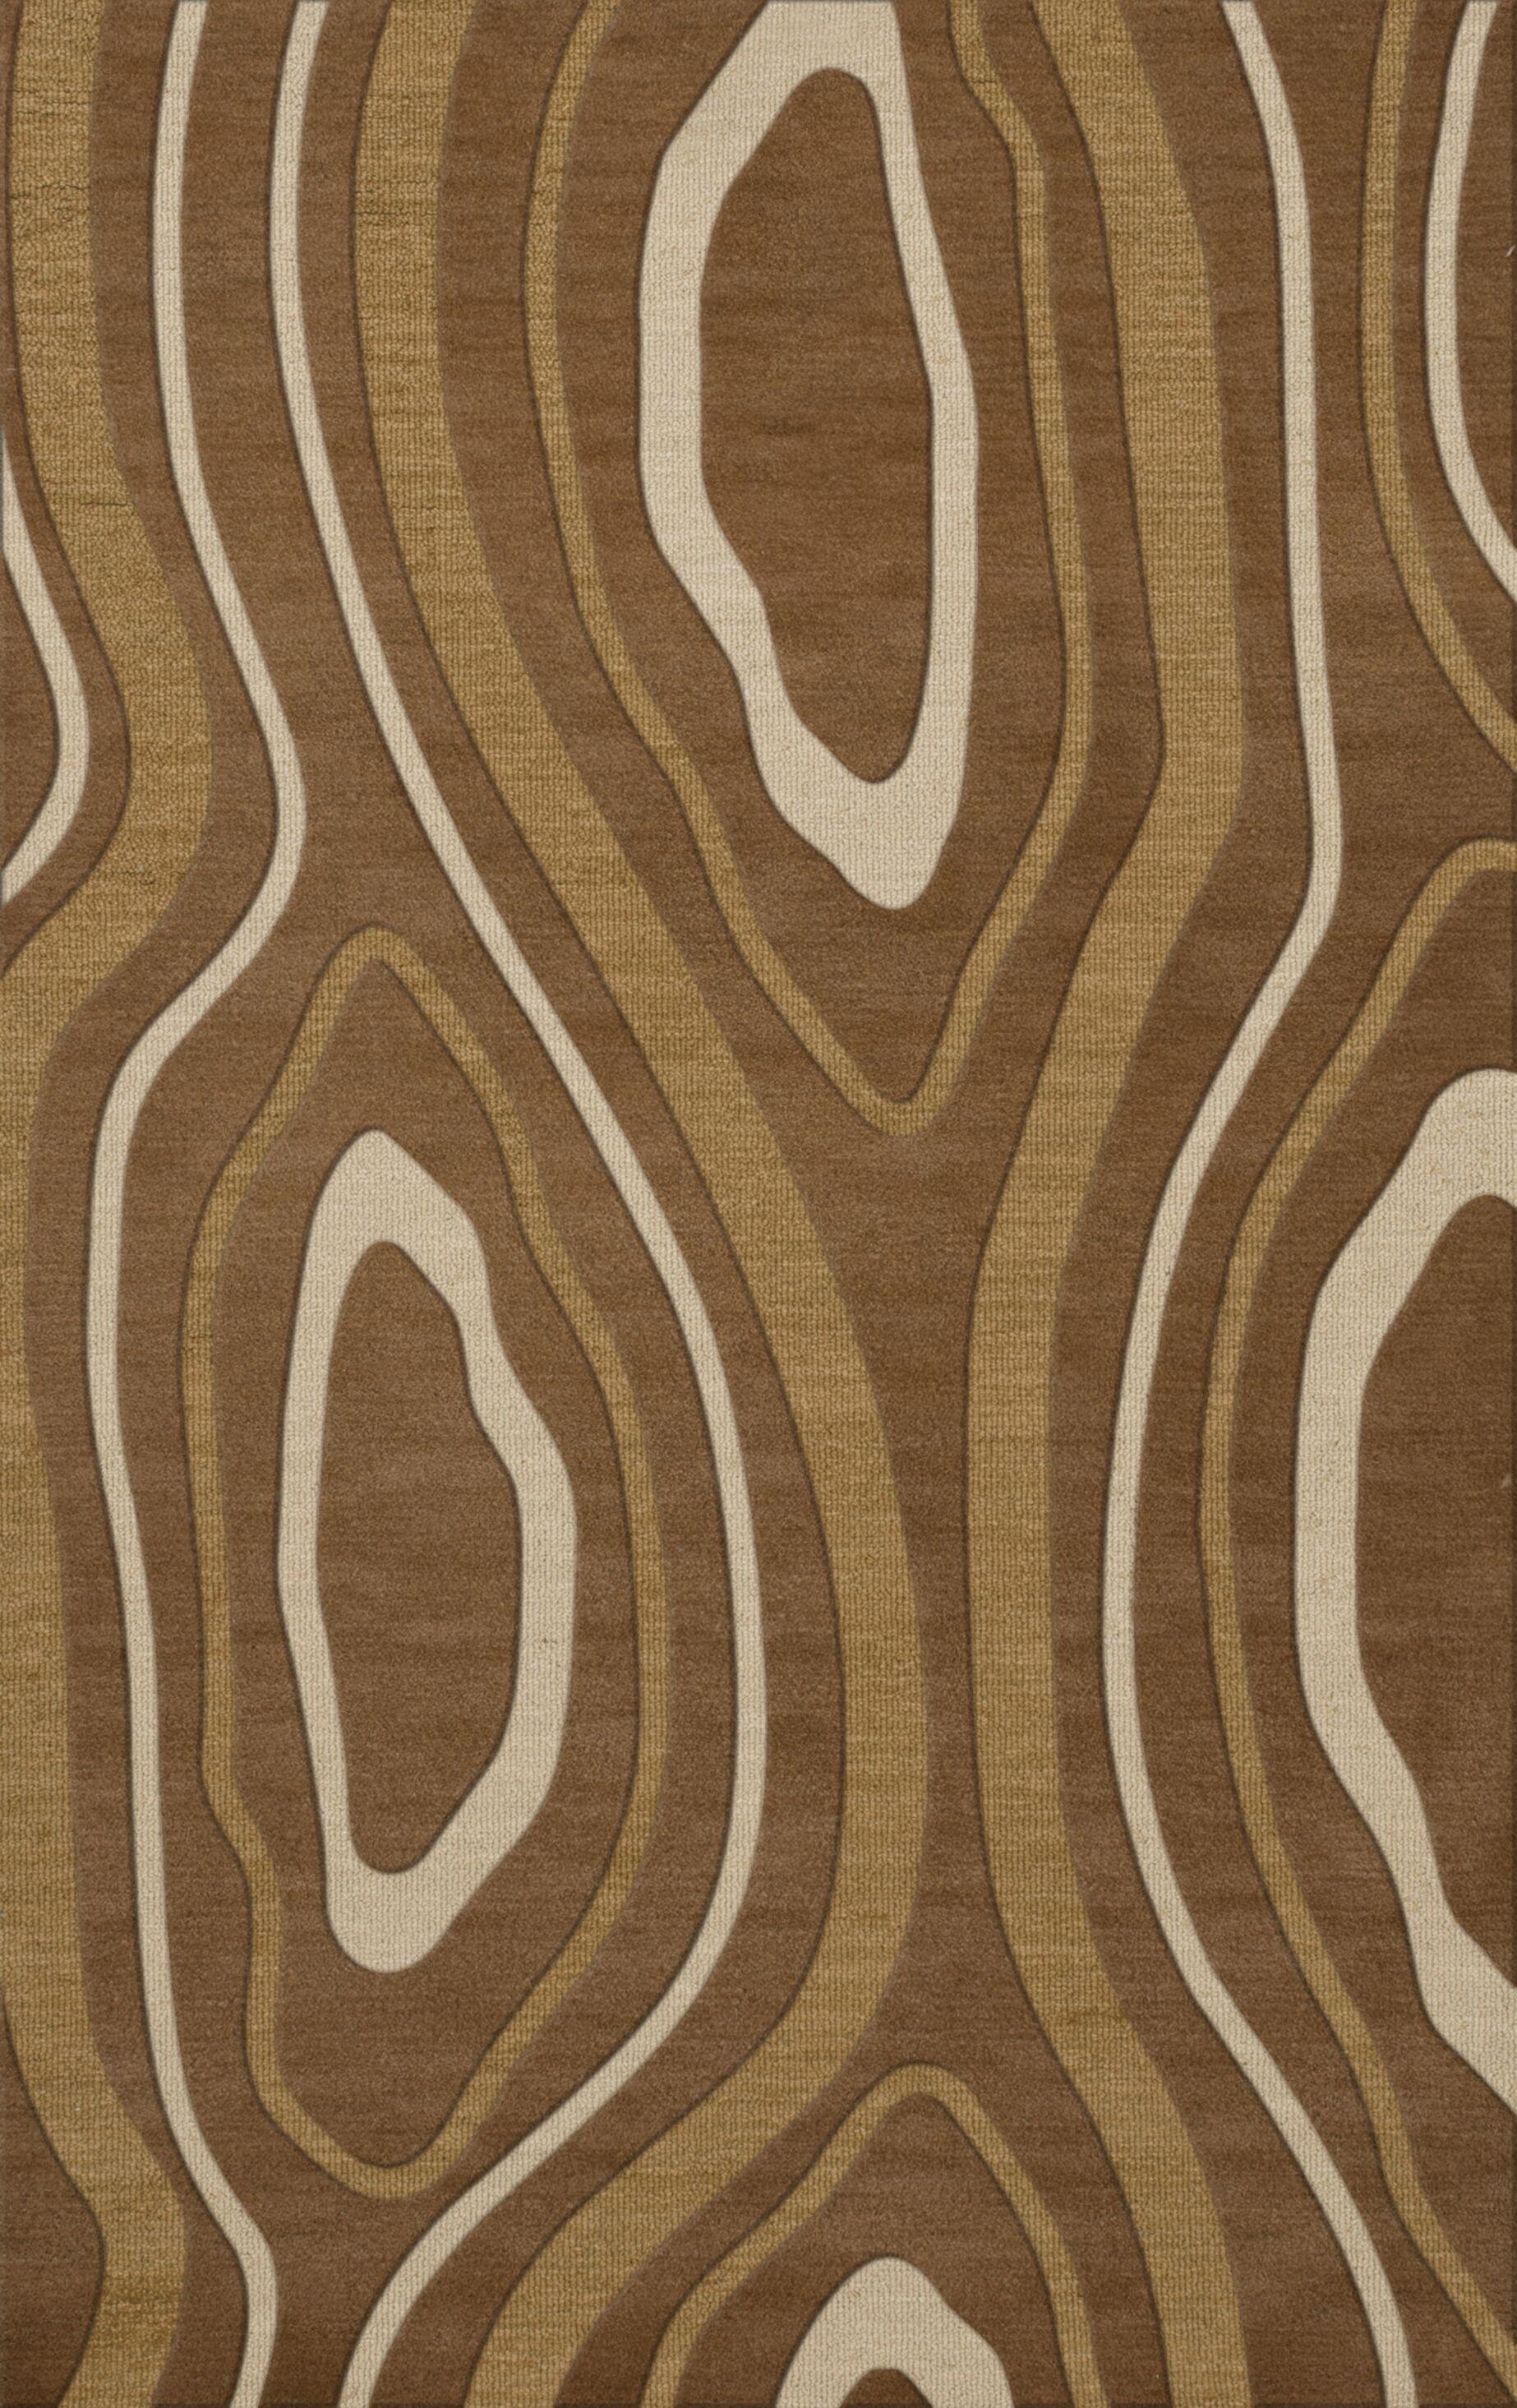 Sarahi Wool Rattan Area Rug Rug Size: Rectangle 4' x 6'